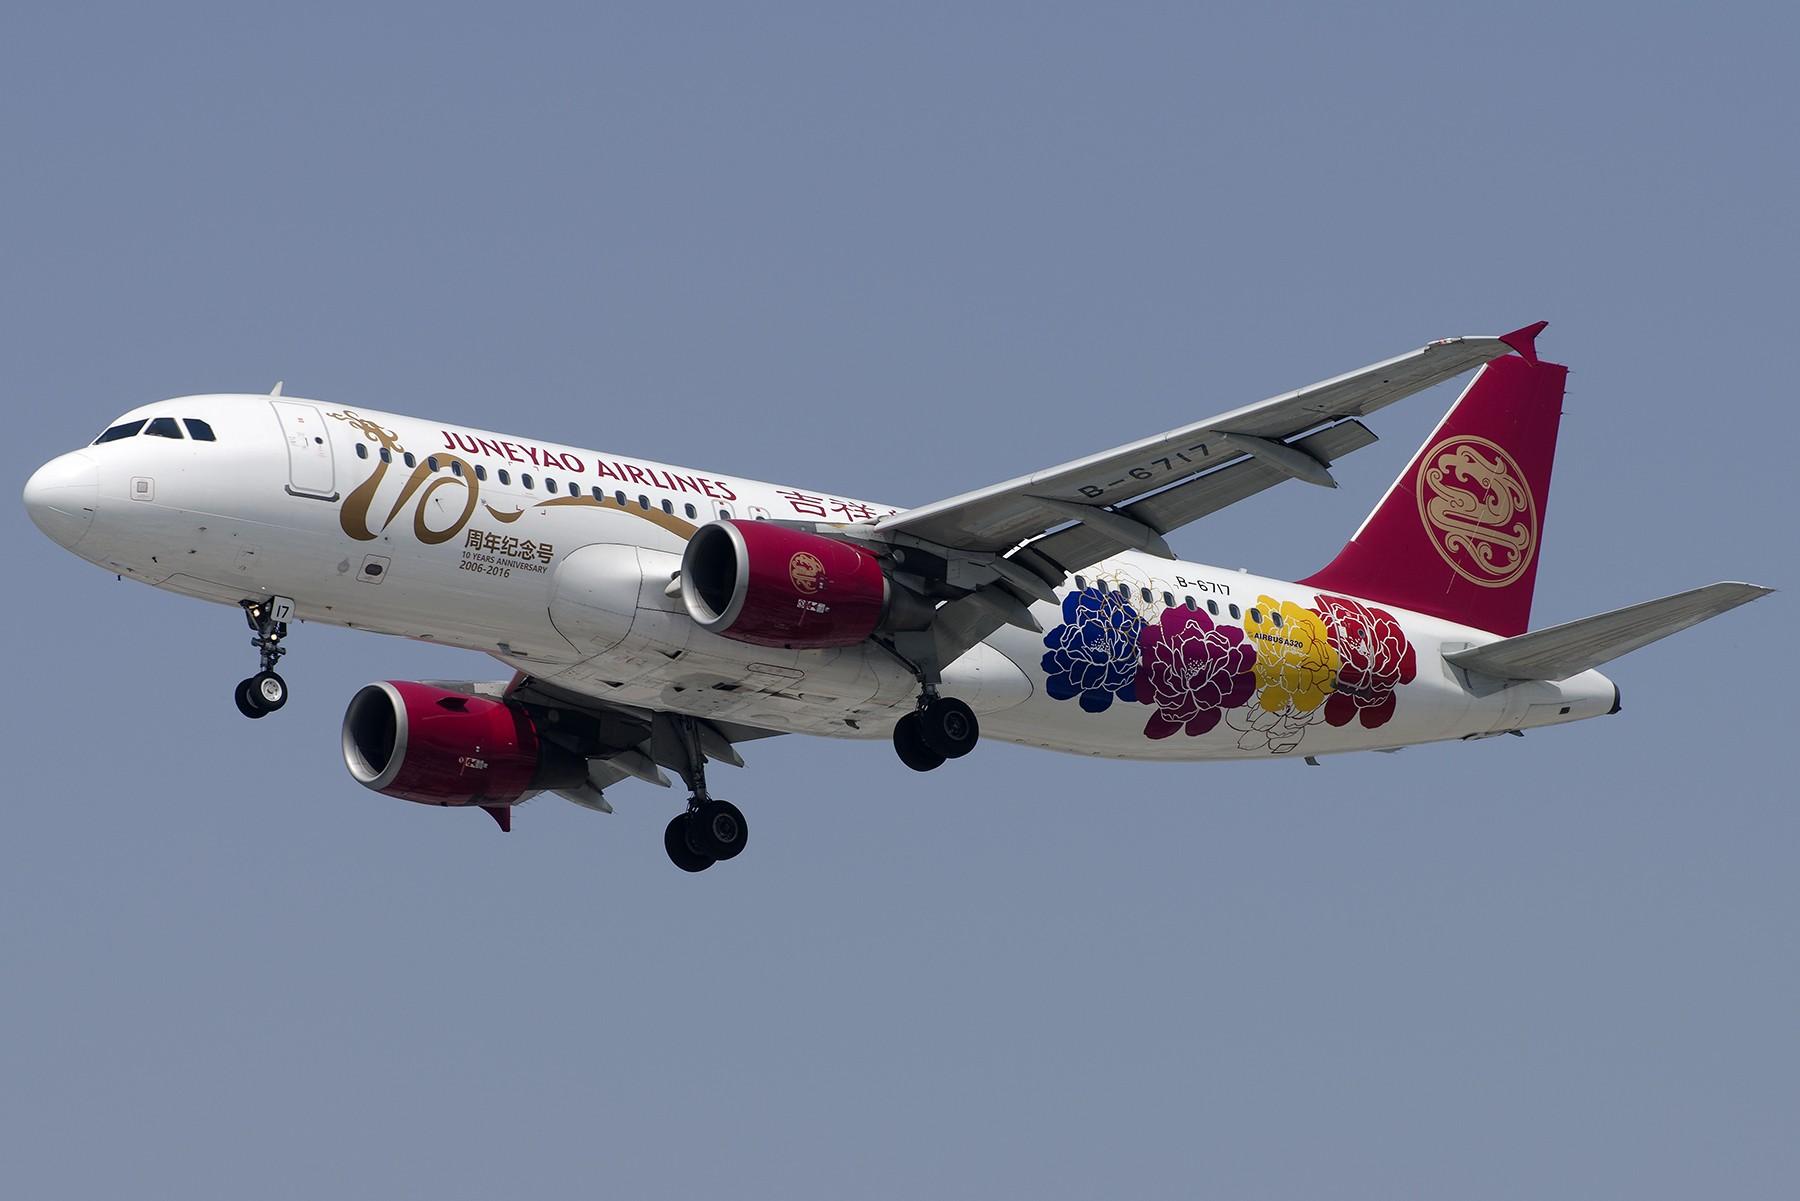 Re:[原创][原创]【SHA拍机*1800大图】4月拍的了,记得那天好货还挺多 AIRBUS A320-200 B-6717 中国上海虹桥国际机场